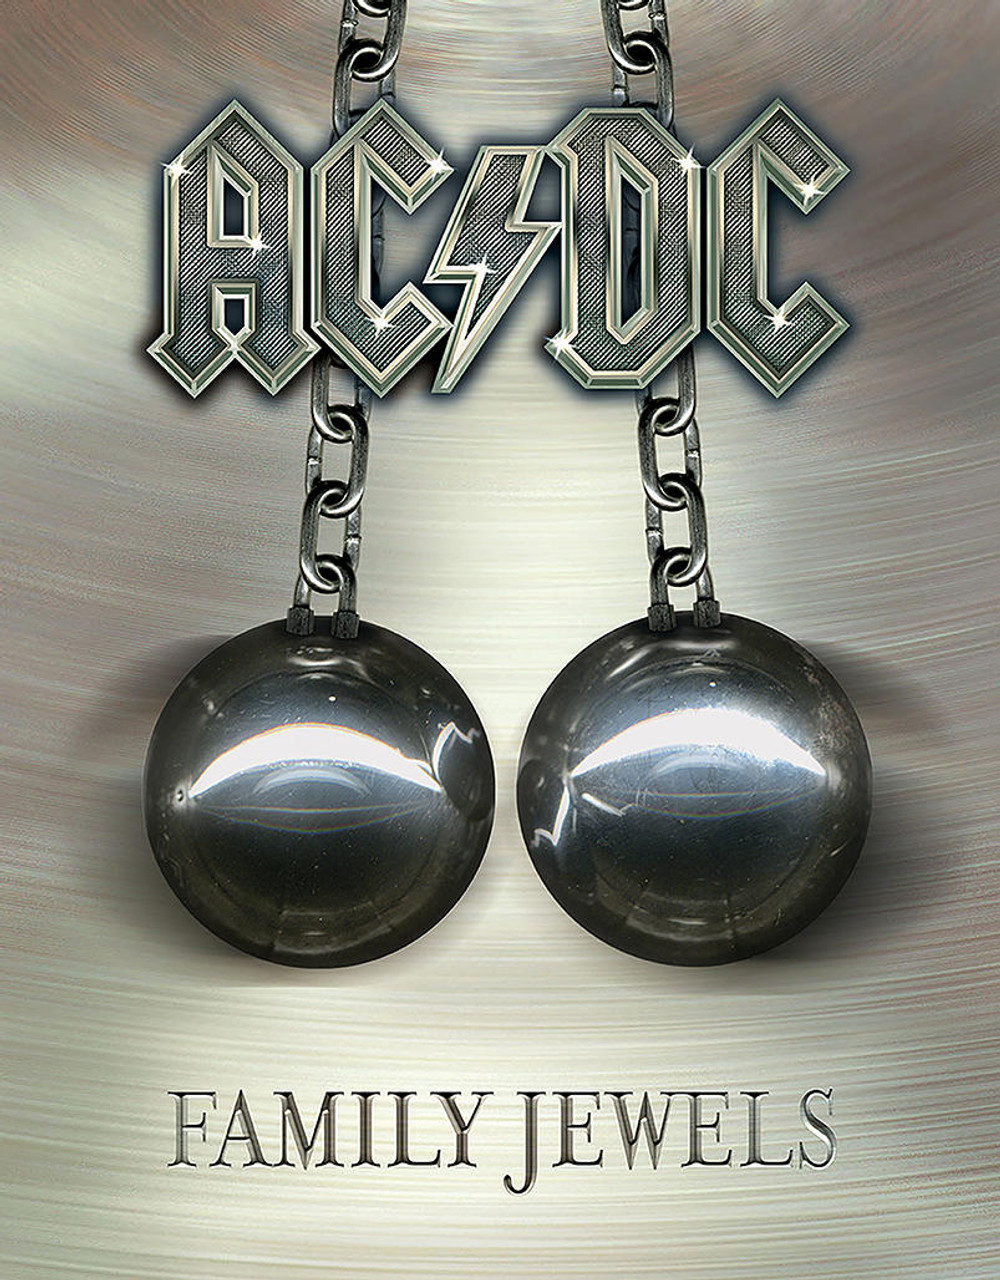 AC/DC Family Jewels